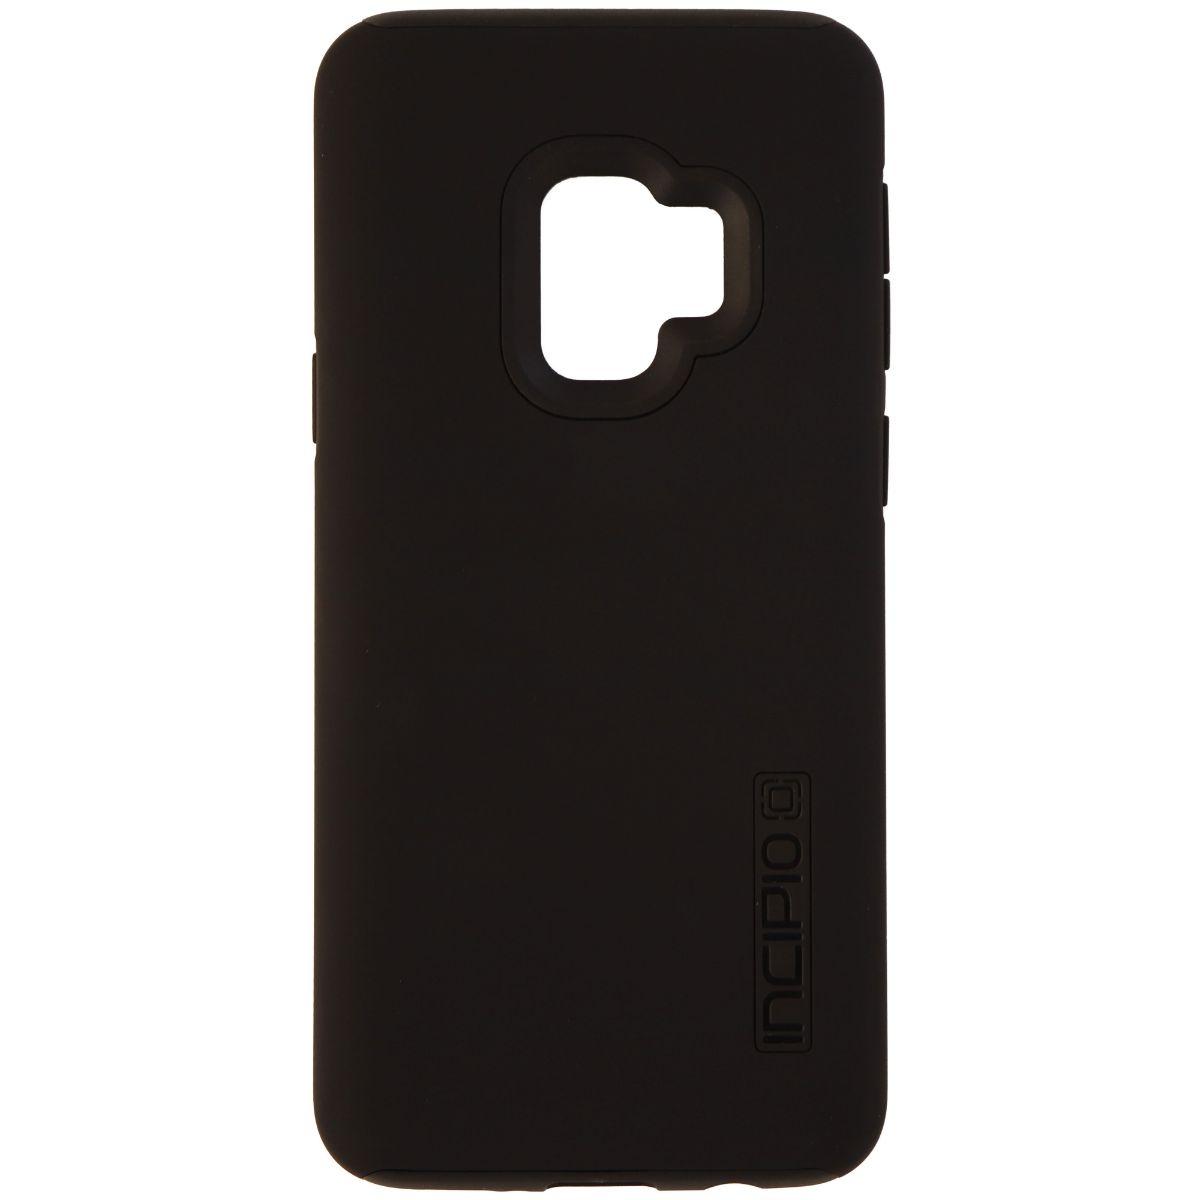 Incipio DualPro Series Dual Layer Case for Samsung Galaxy S9 - Matte Black